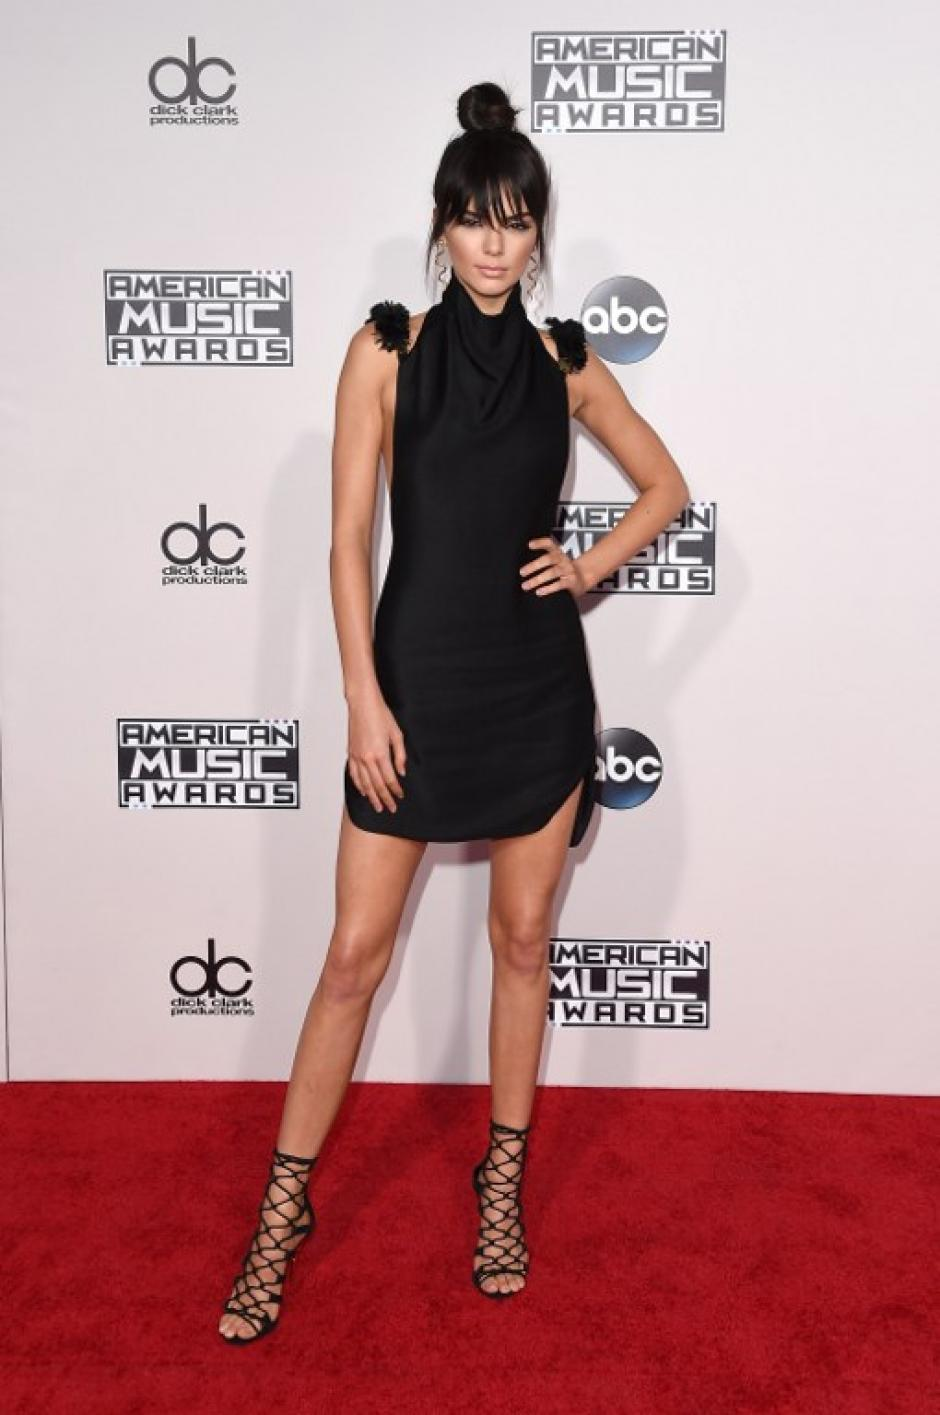 La modelo Kendall Jenner posa en la alfombra roja de los American Music Awards. (Foto: Jason Merritt / AFP)